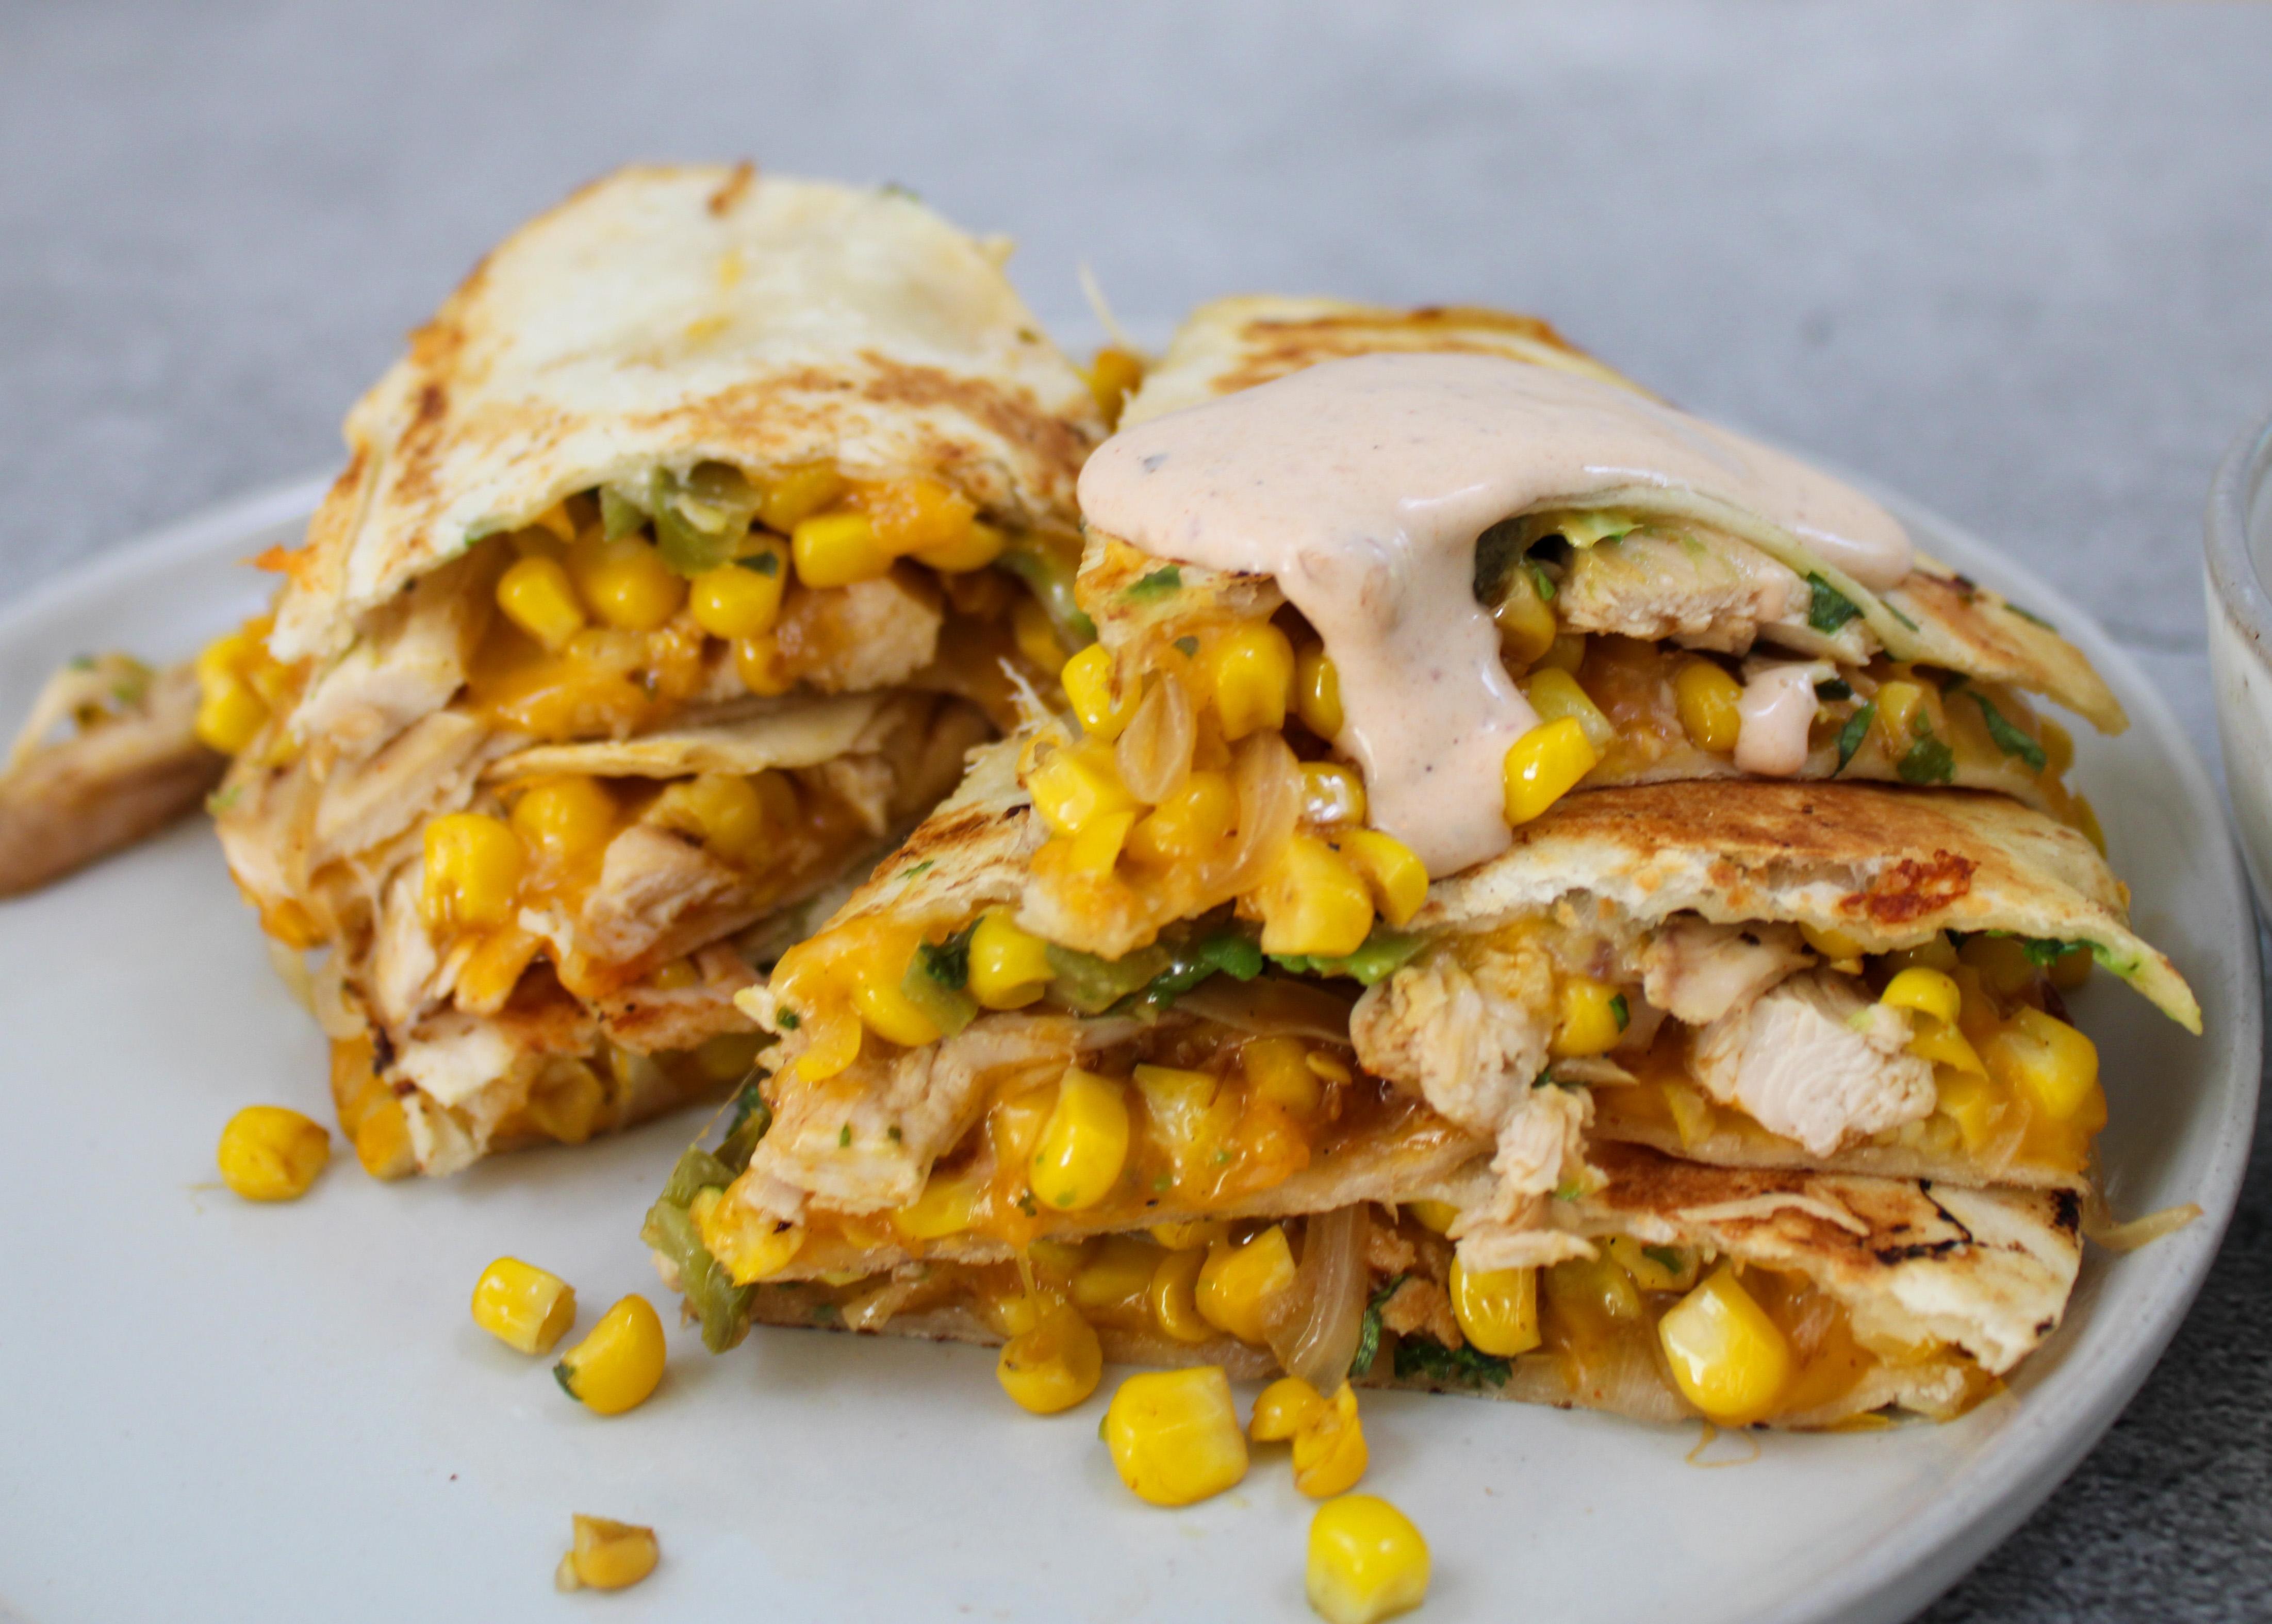 Loaded Chicken Quesadilla + Chipotle Ranch